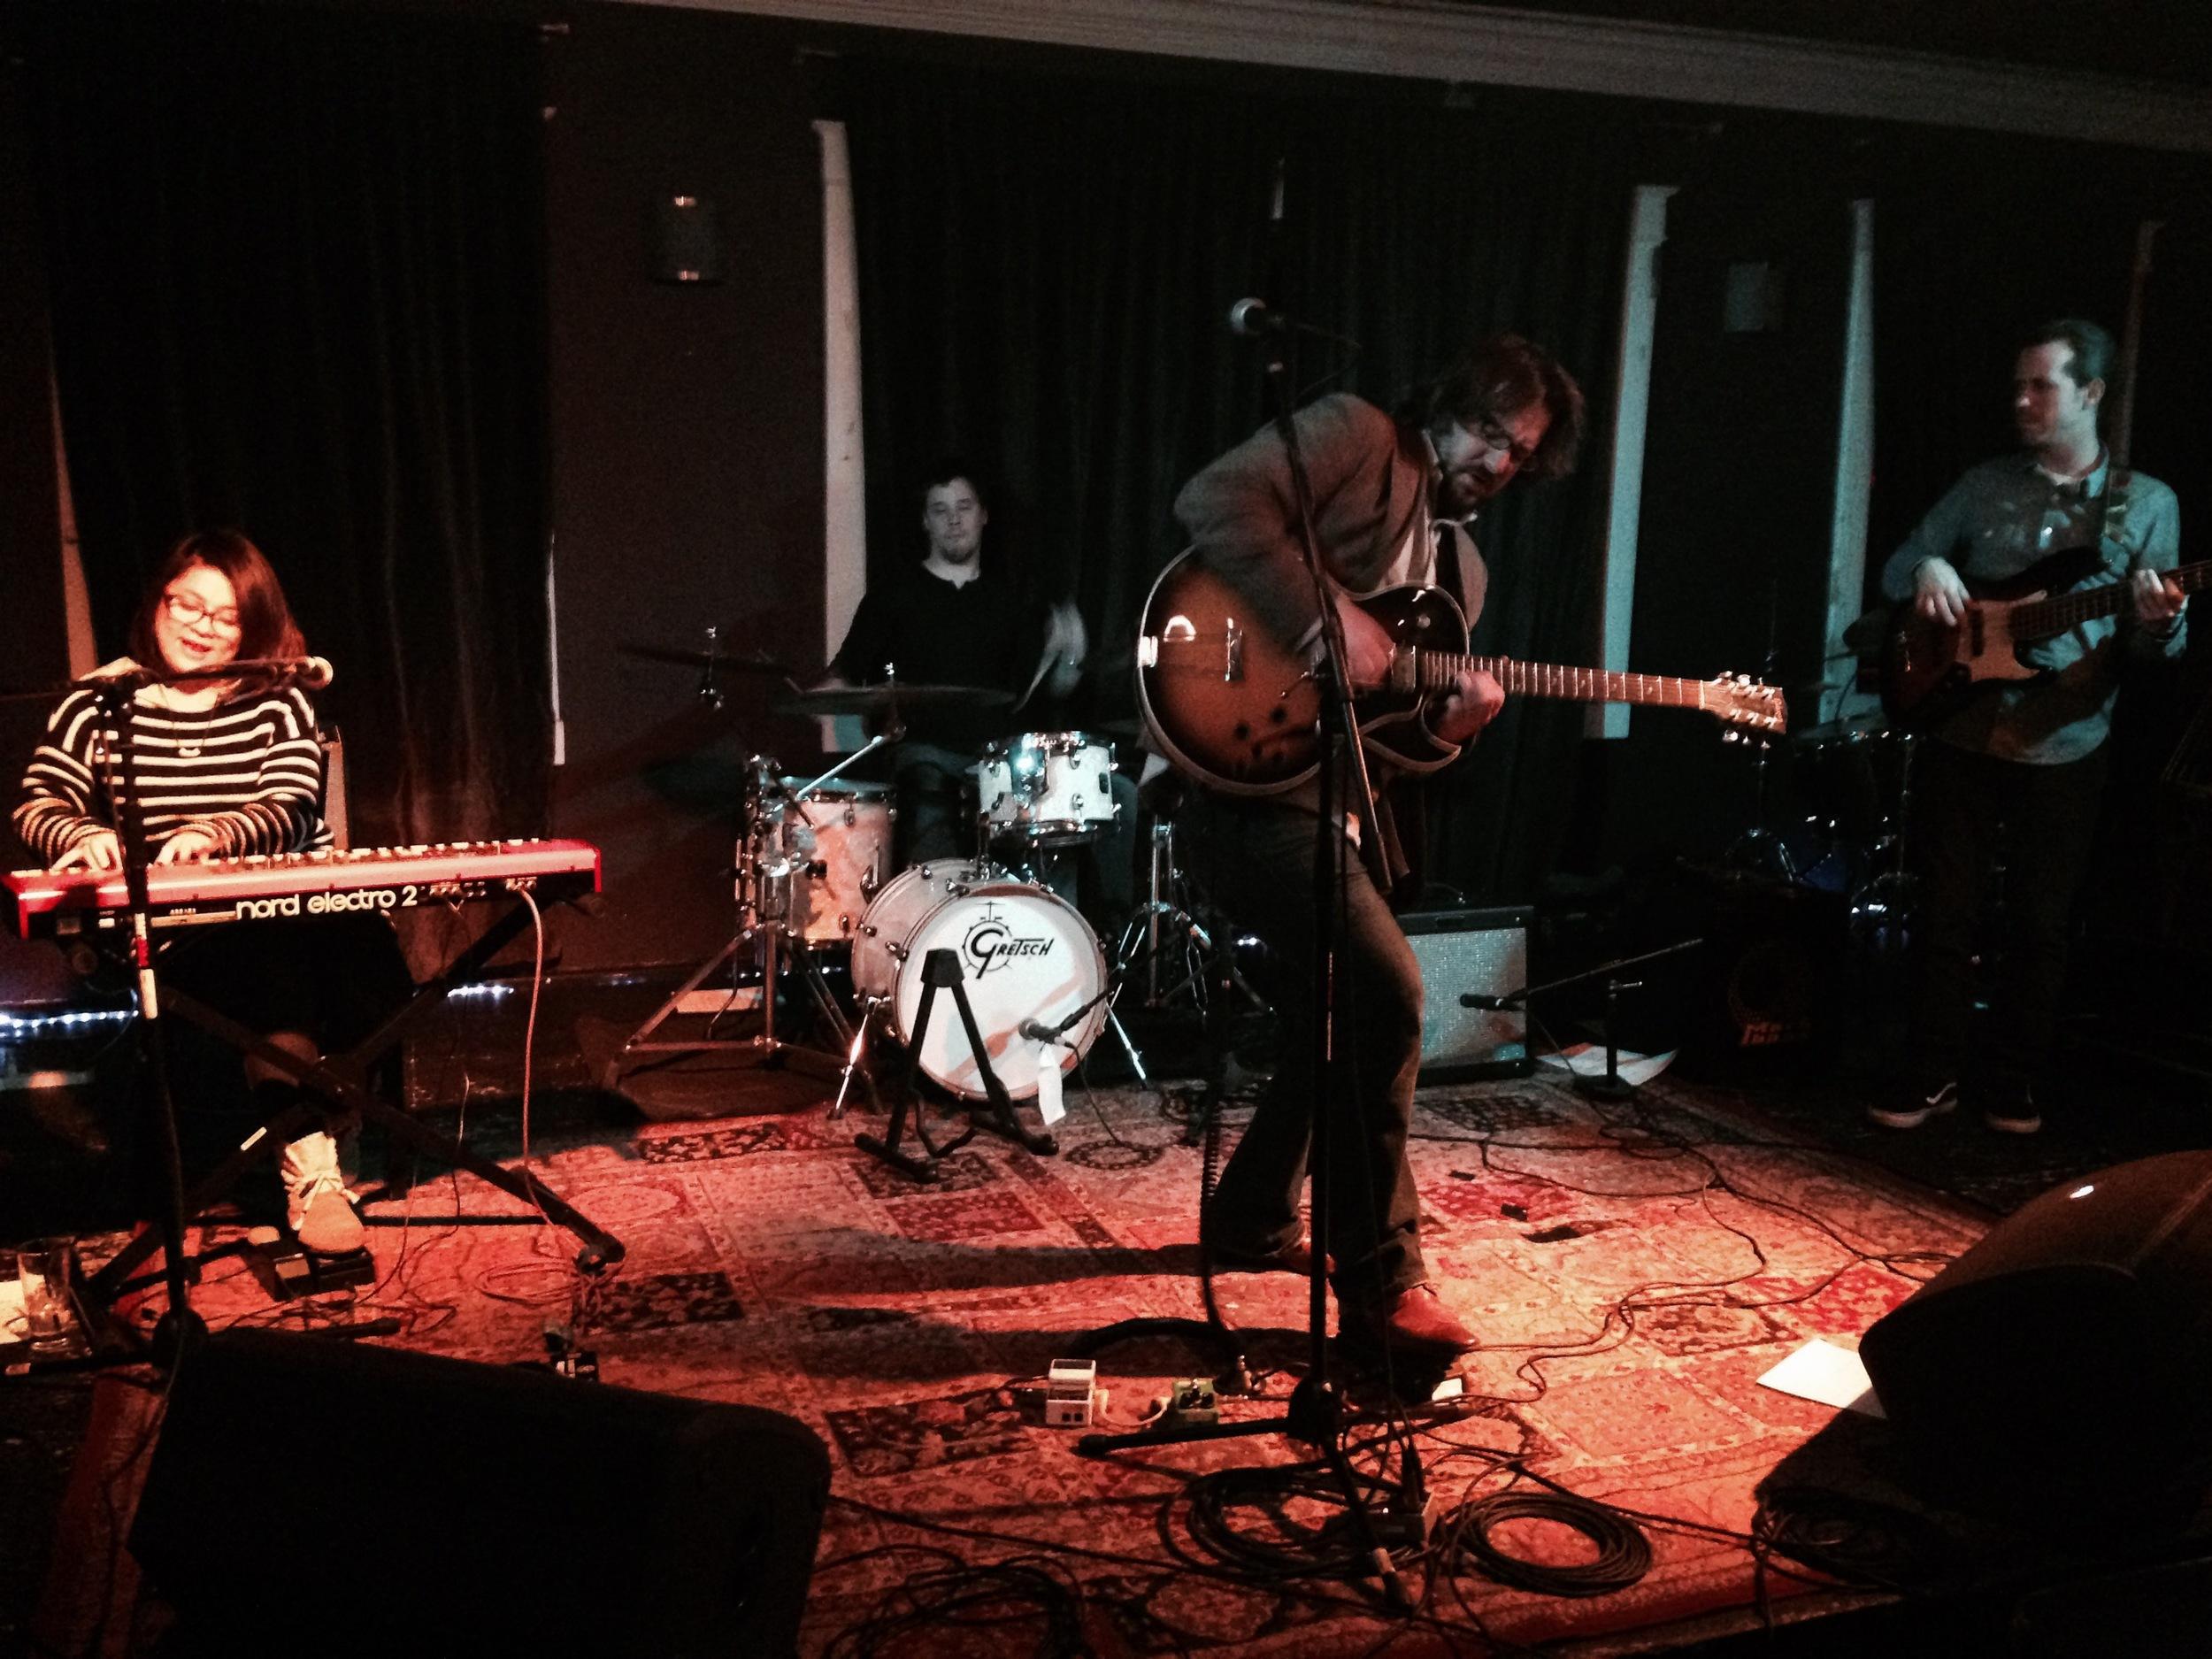 Kazuri Arai (Keyboard), Austin Lauritsen (Drums), Adam Dalton (Guitar) and Steo Britton (Bass)  Mad Donna's, Nashville, TN 1/9/15